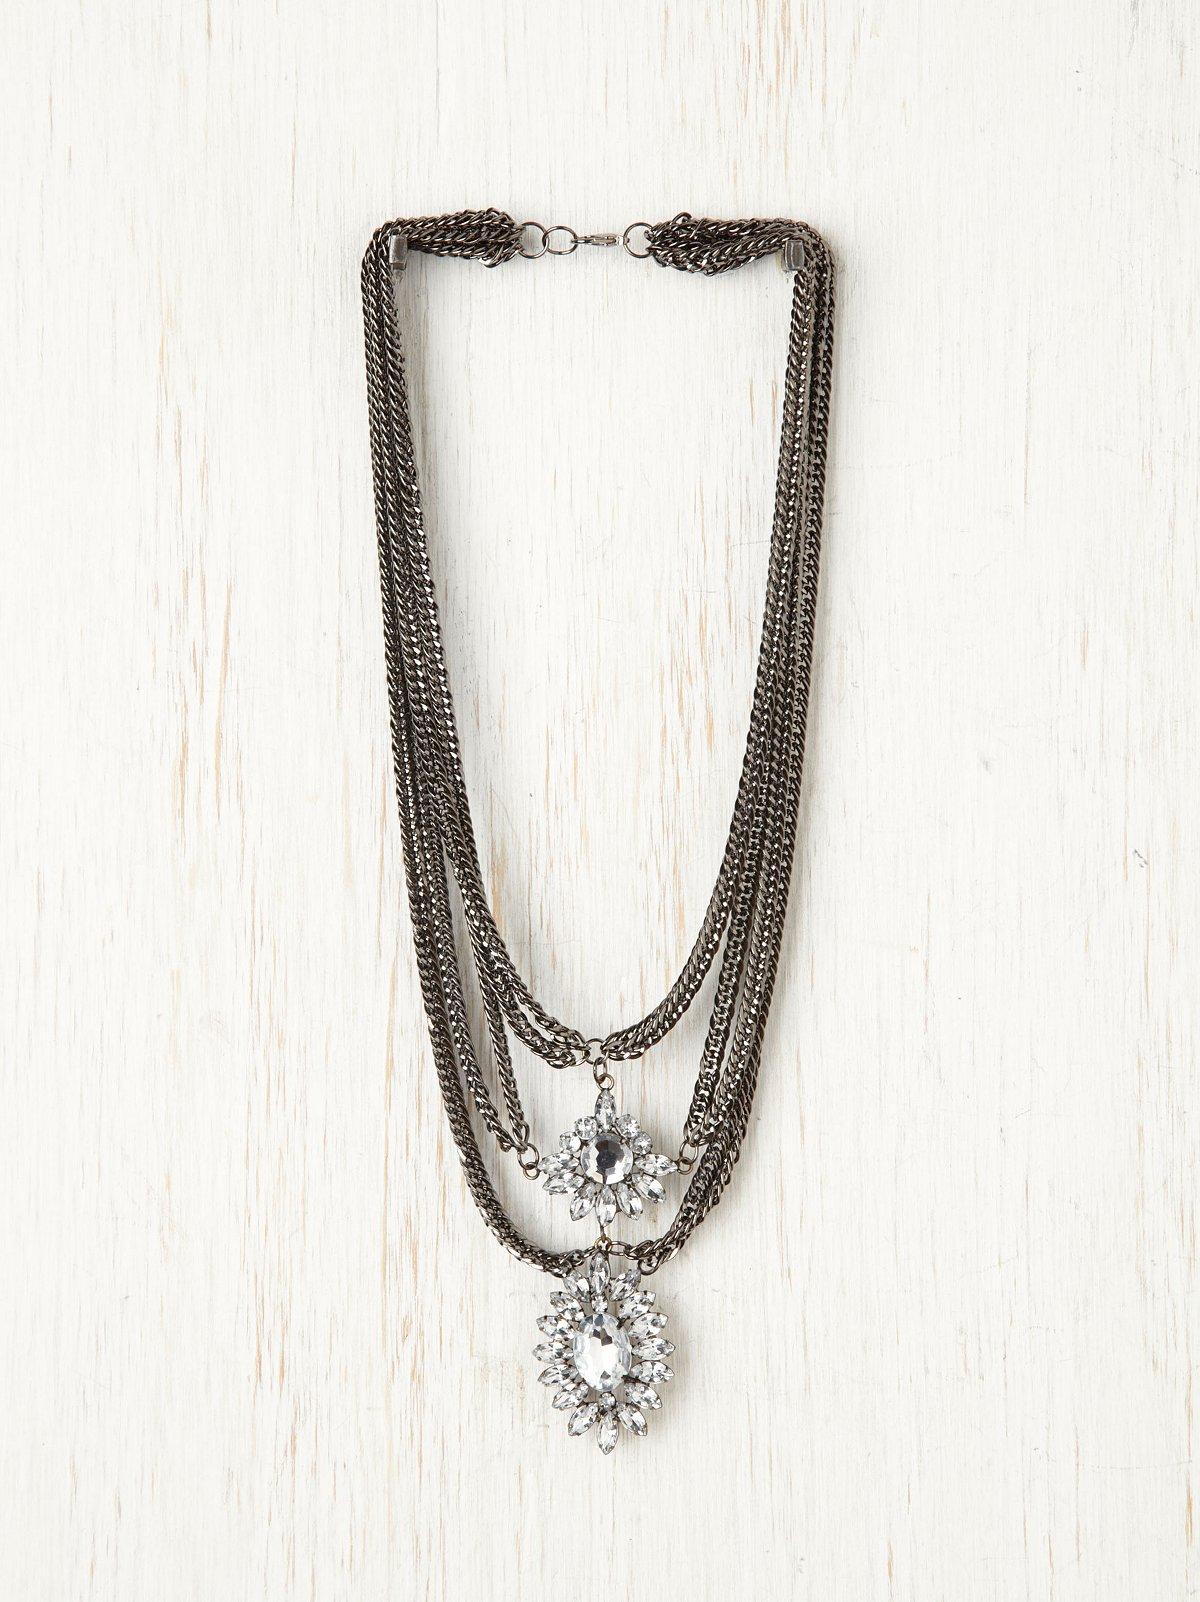 Regal Stone Necklace